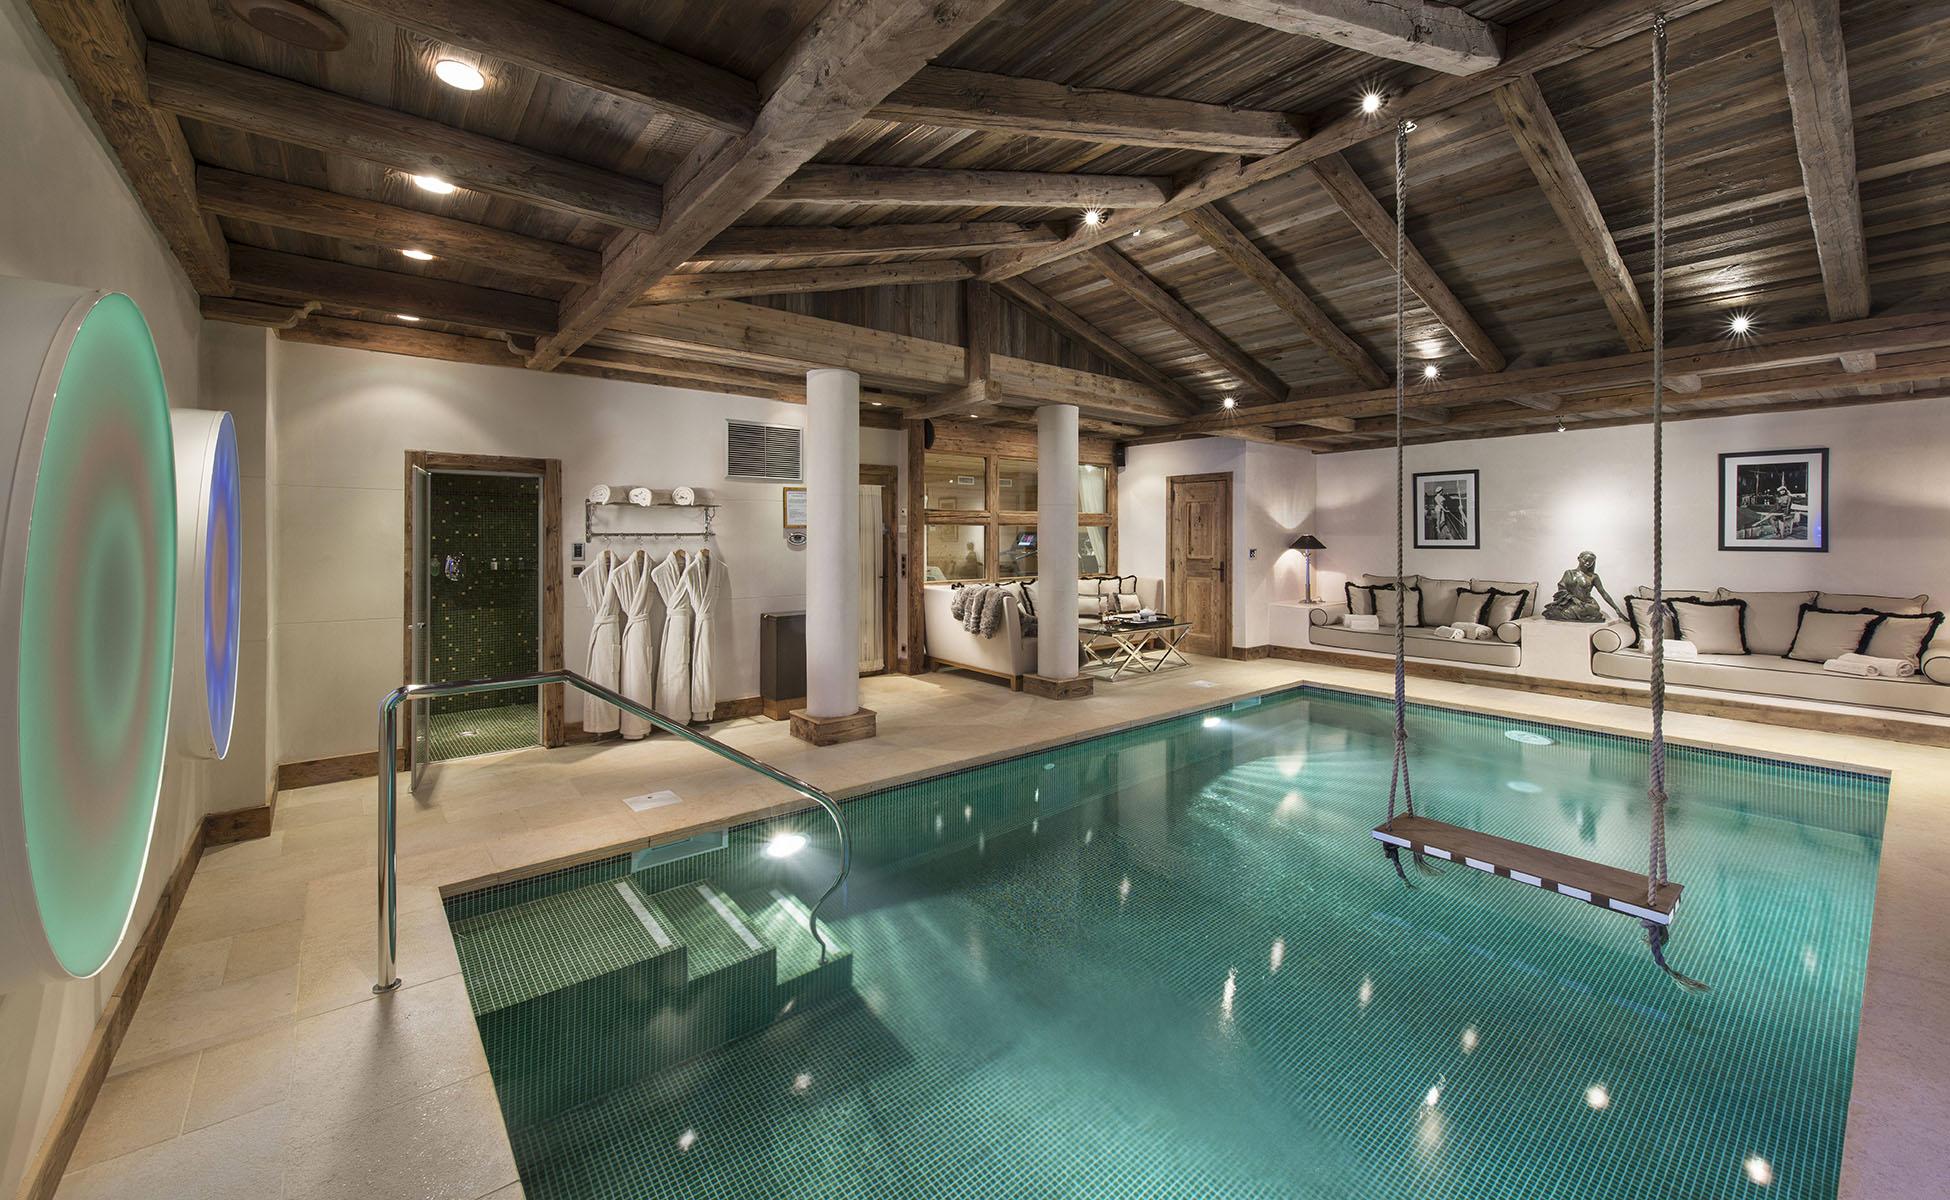 Lovelydays luxury service apartment rental - Courchevel - Great Roc Chalet - Partner - 7 bedrooms - 6 bathrooms - Inside pool - 6790920141e6 - Lovelydays